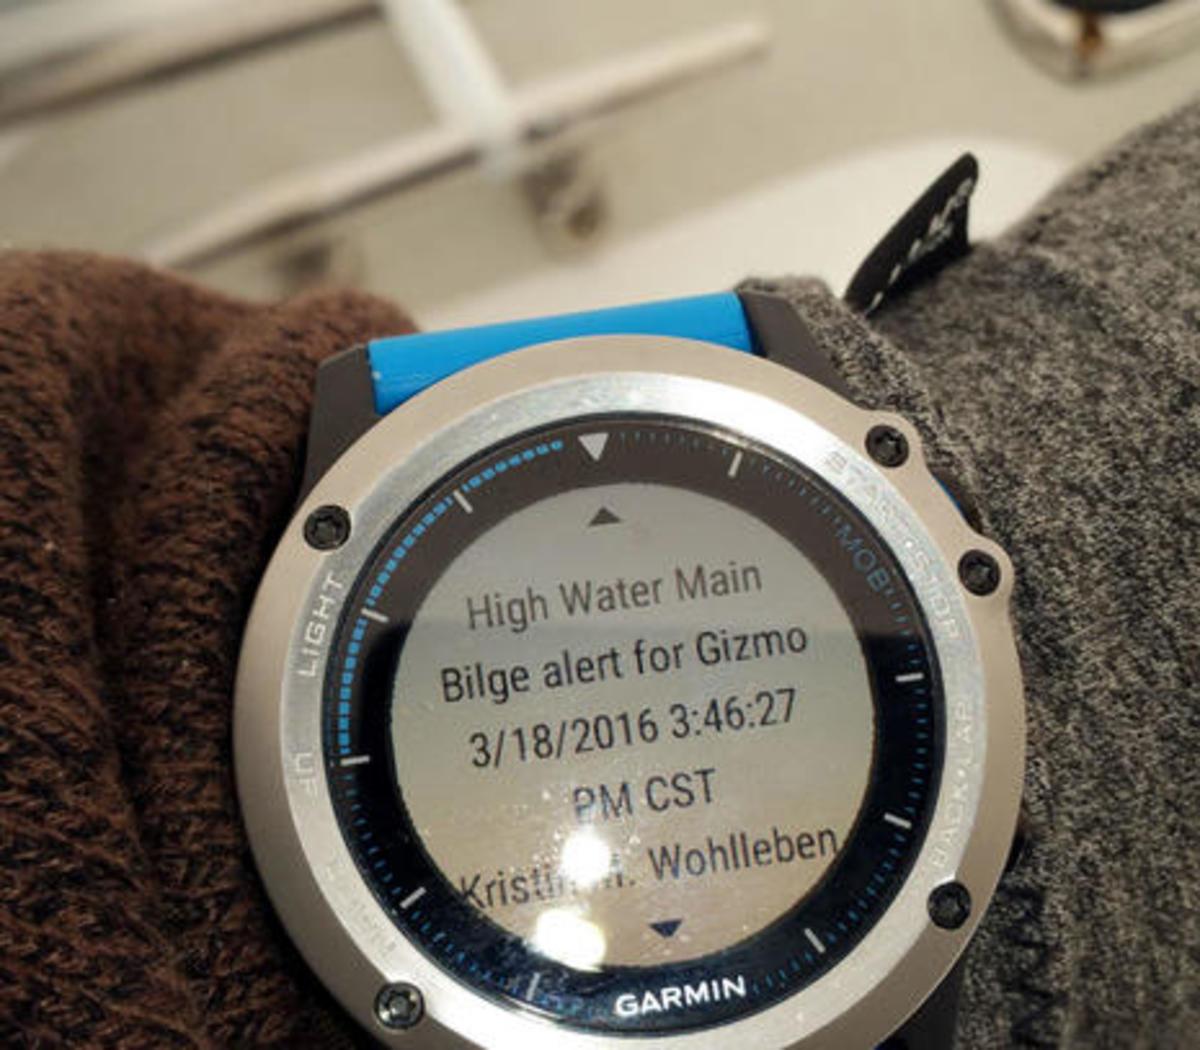 Boat Command email alarm on Garmin Quatix